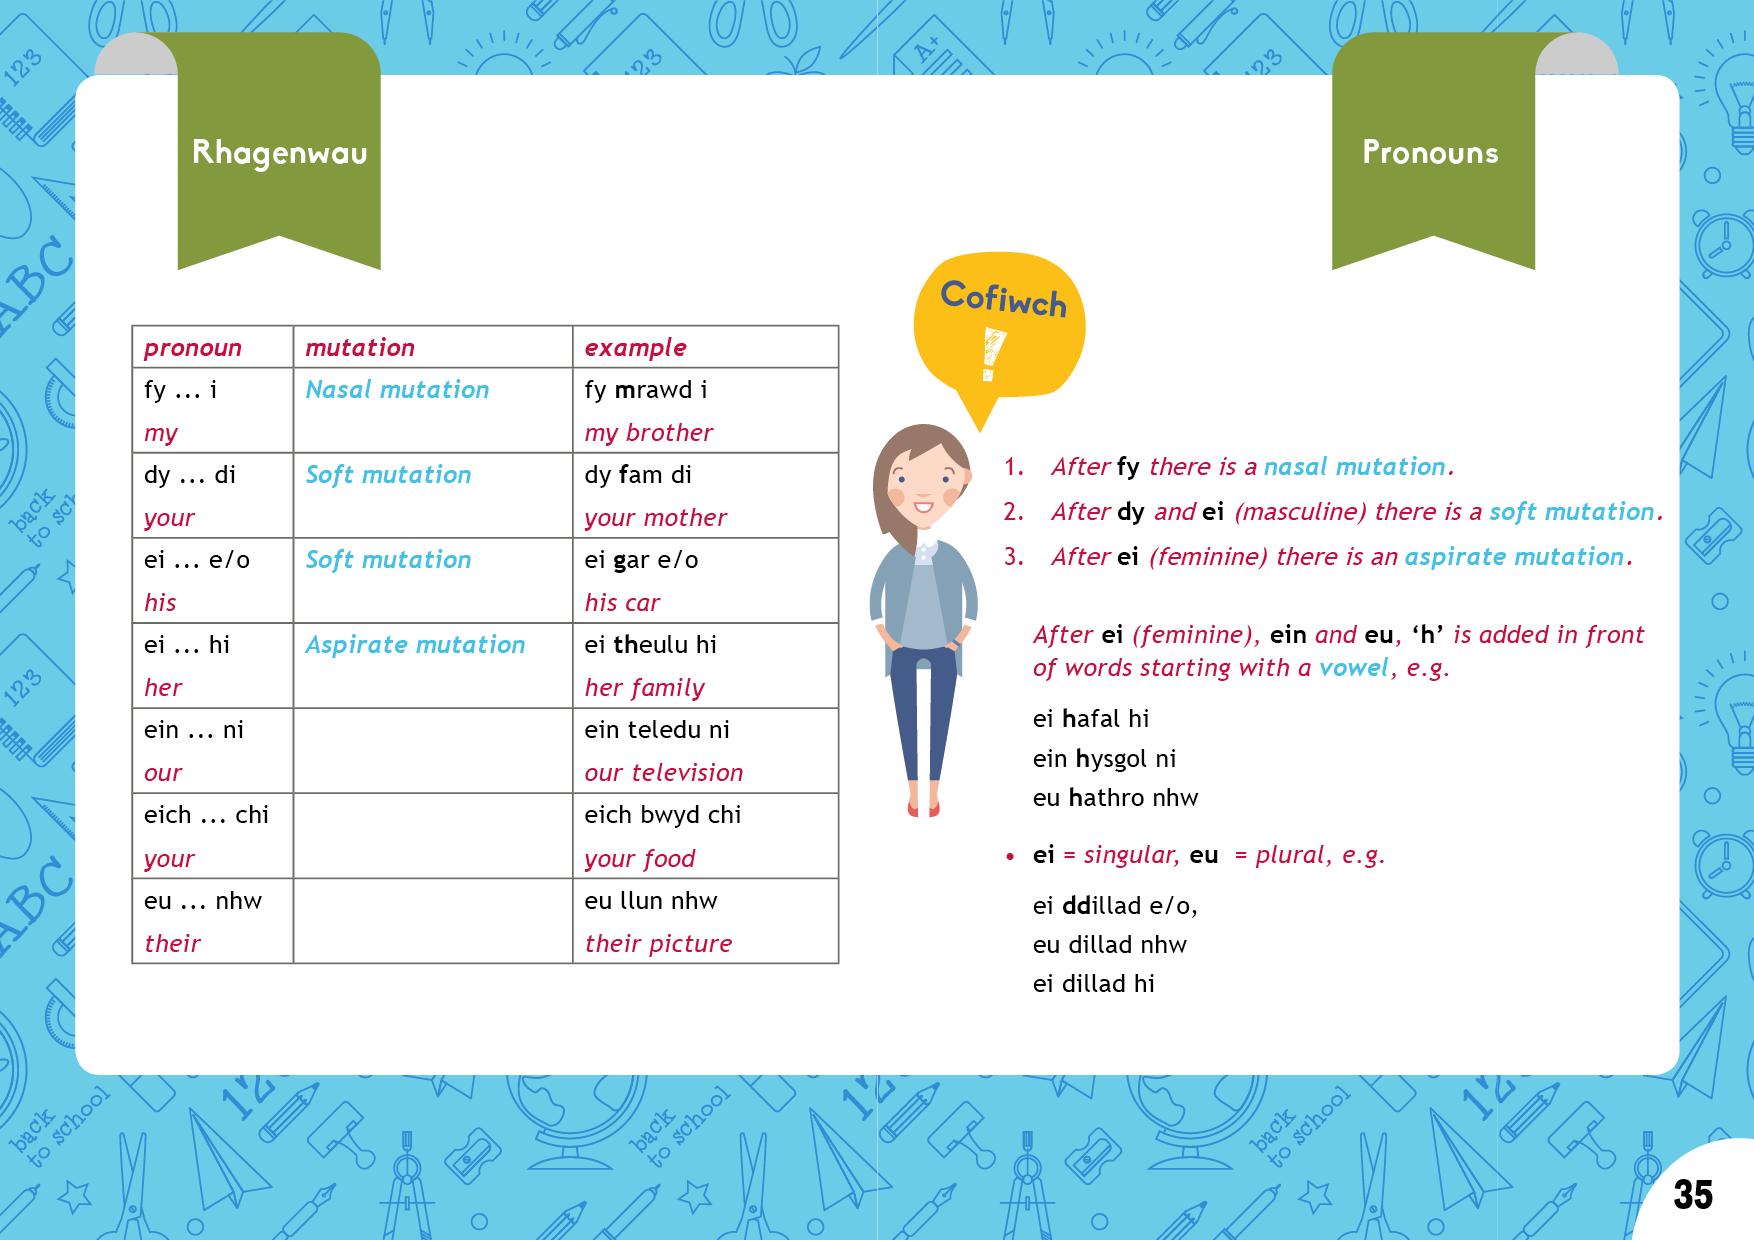 Rhagenwau | Pronouns